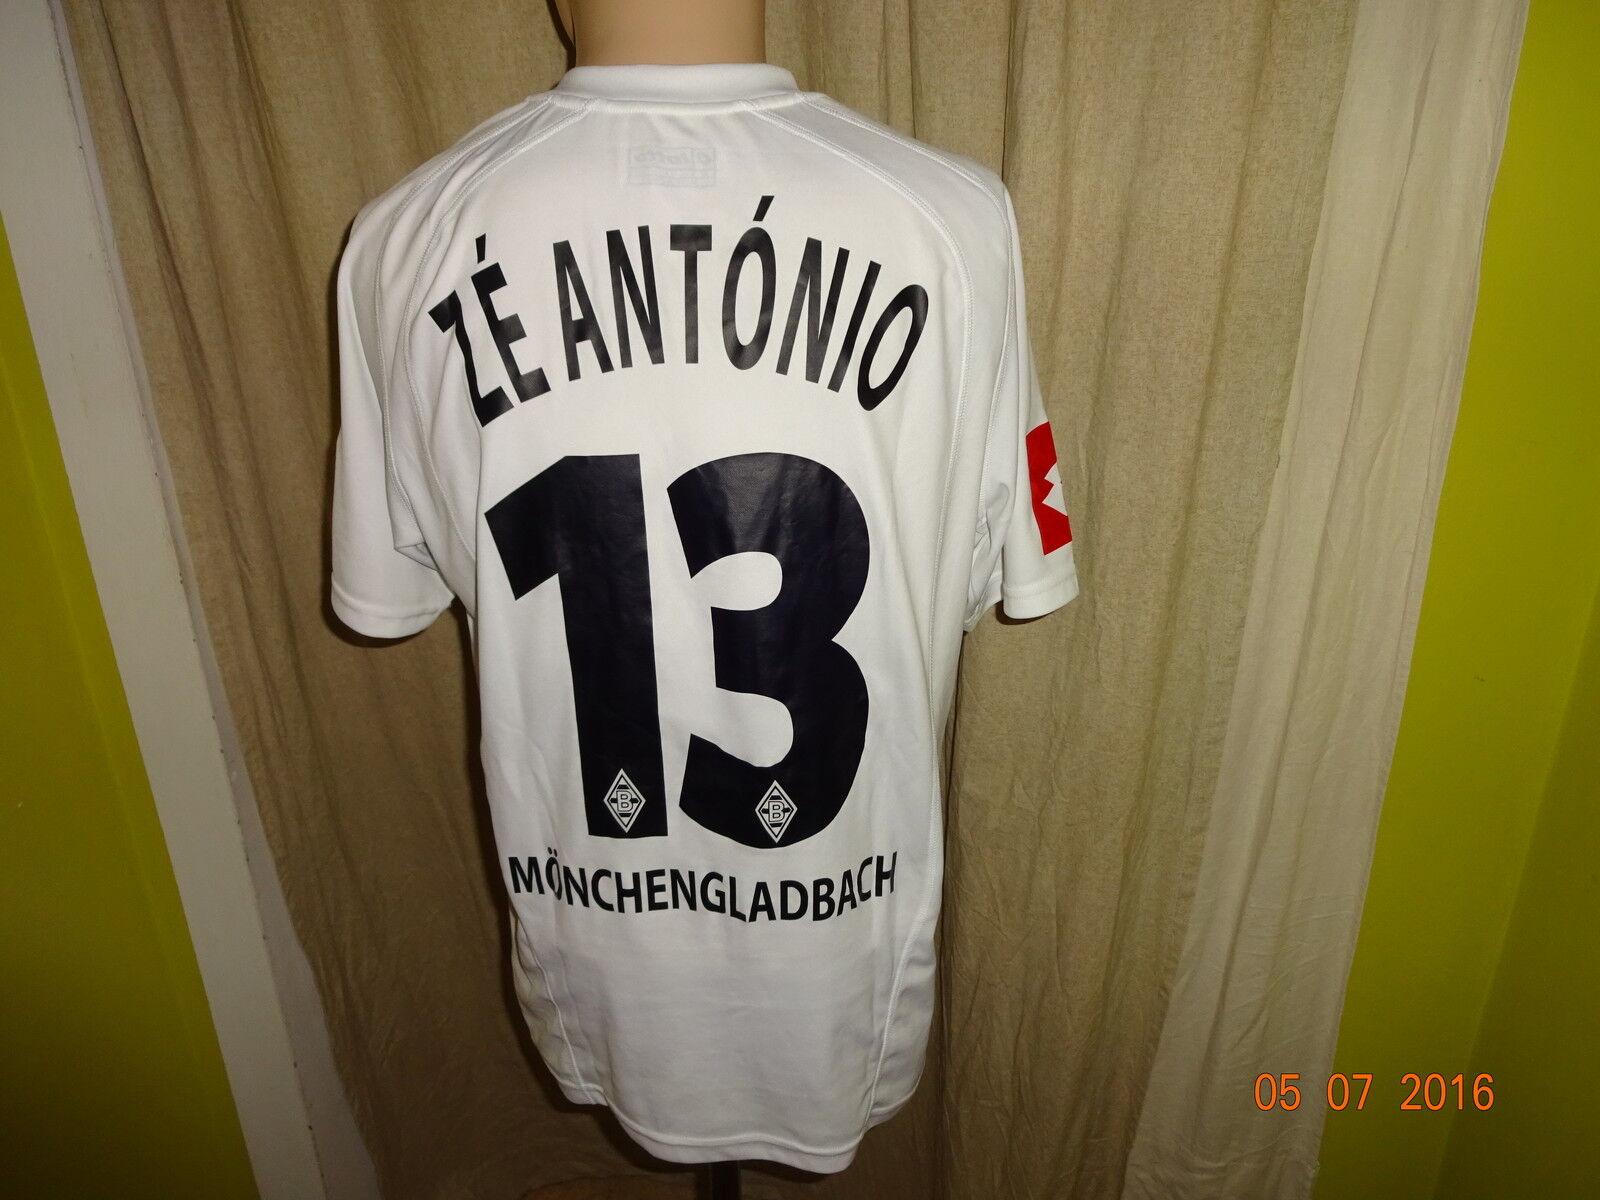 Borussia Mönchengladbach Lotto Trikot 2005/06